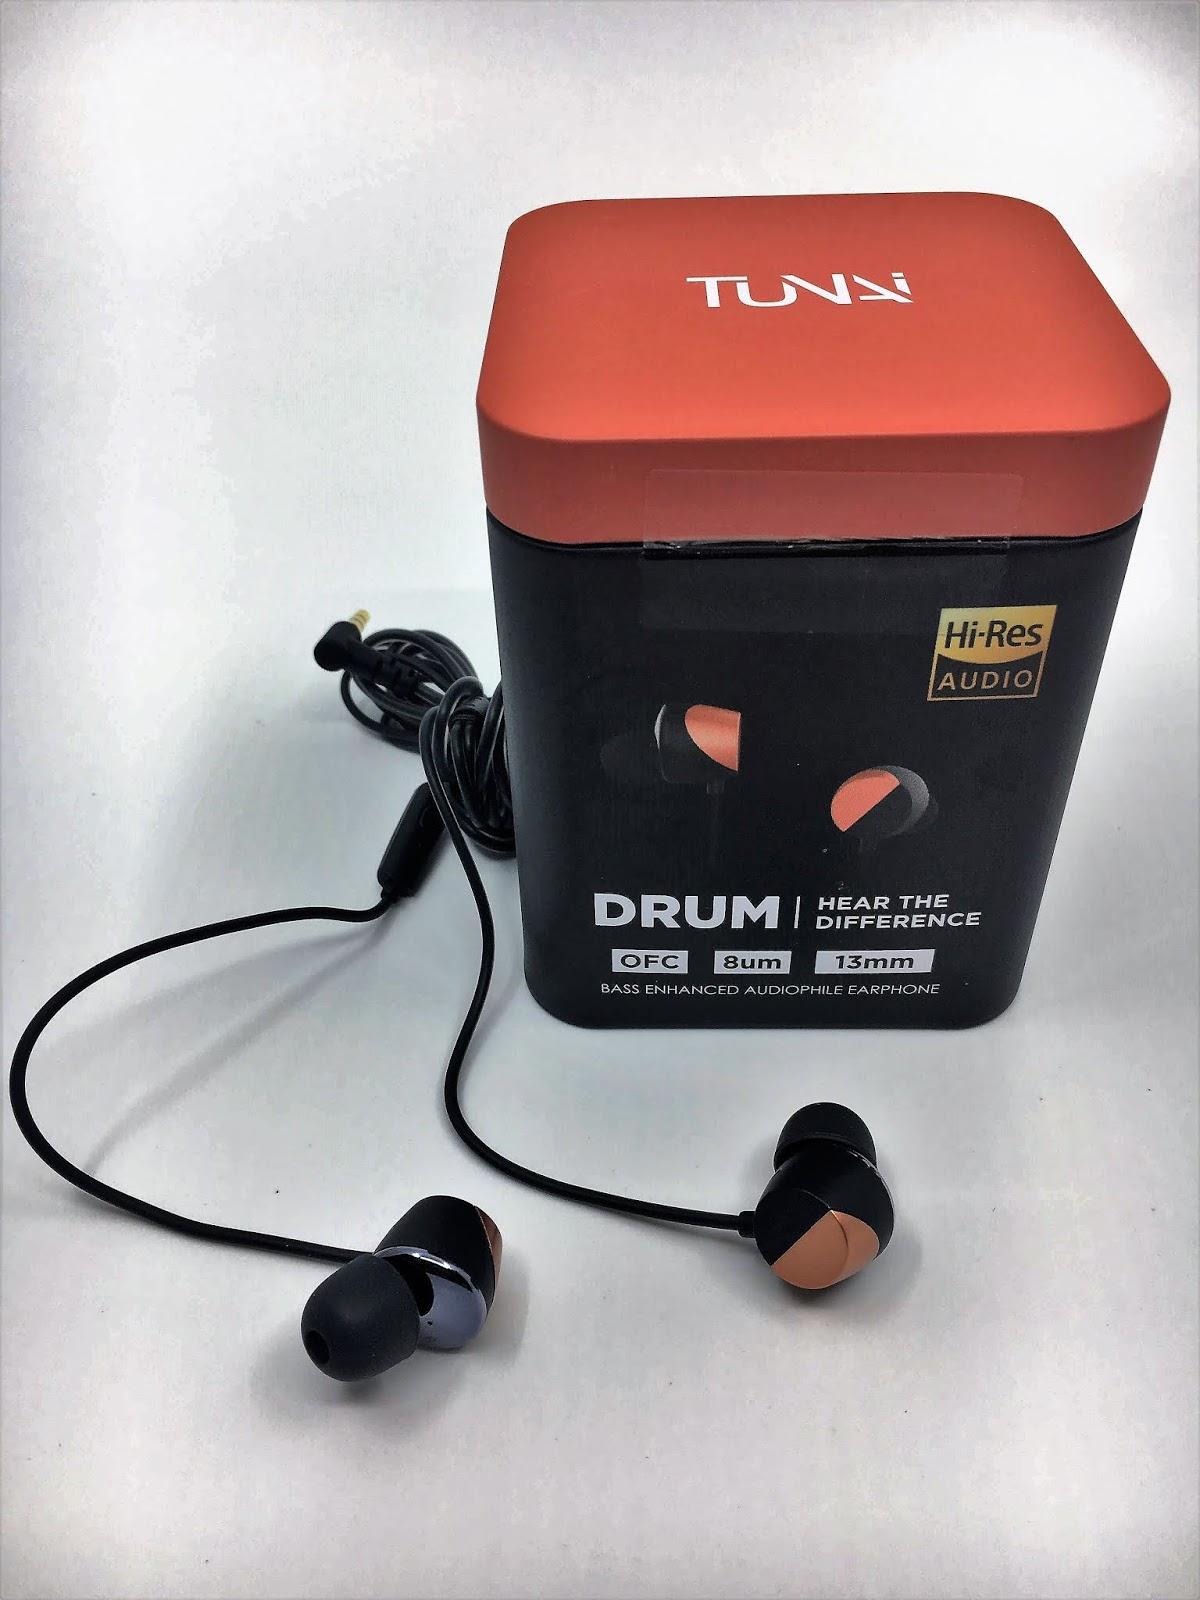 21816c252dfc Giveaway Tunai Creative Drum Earphones Review